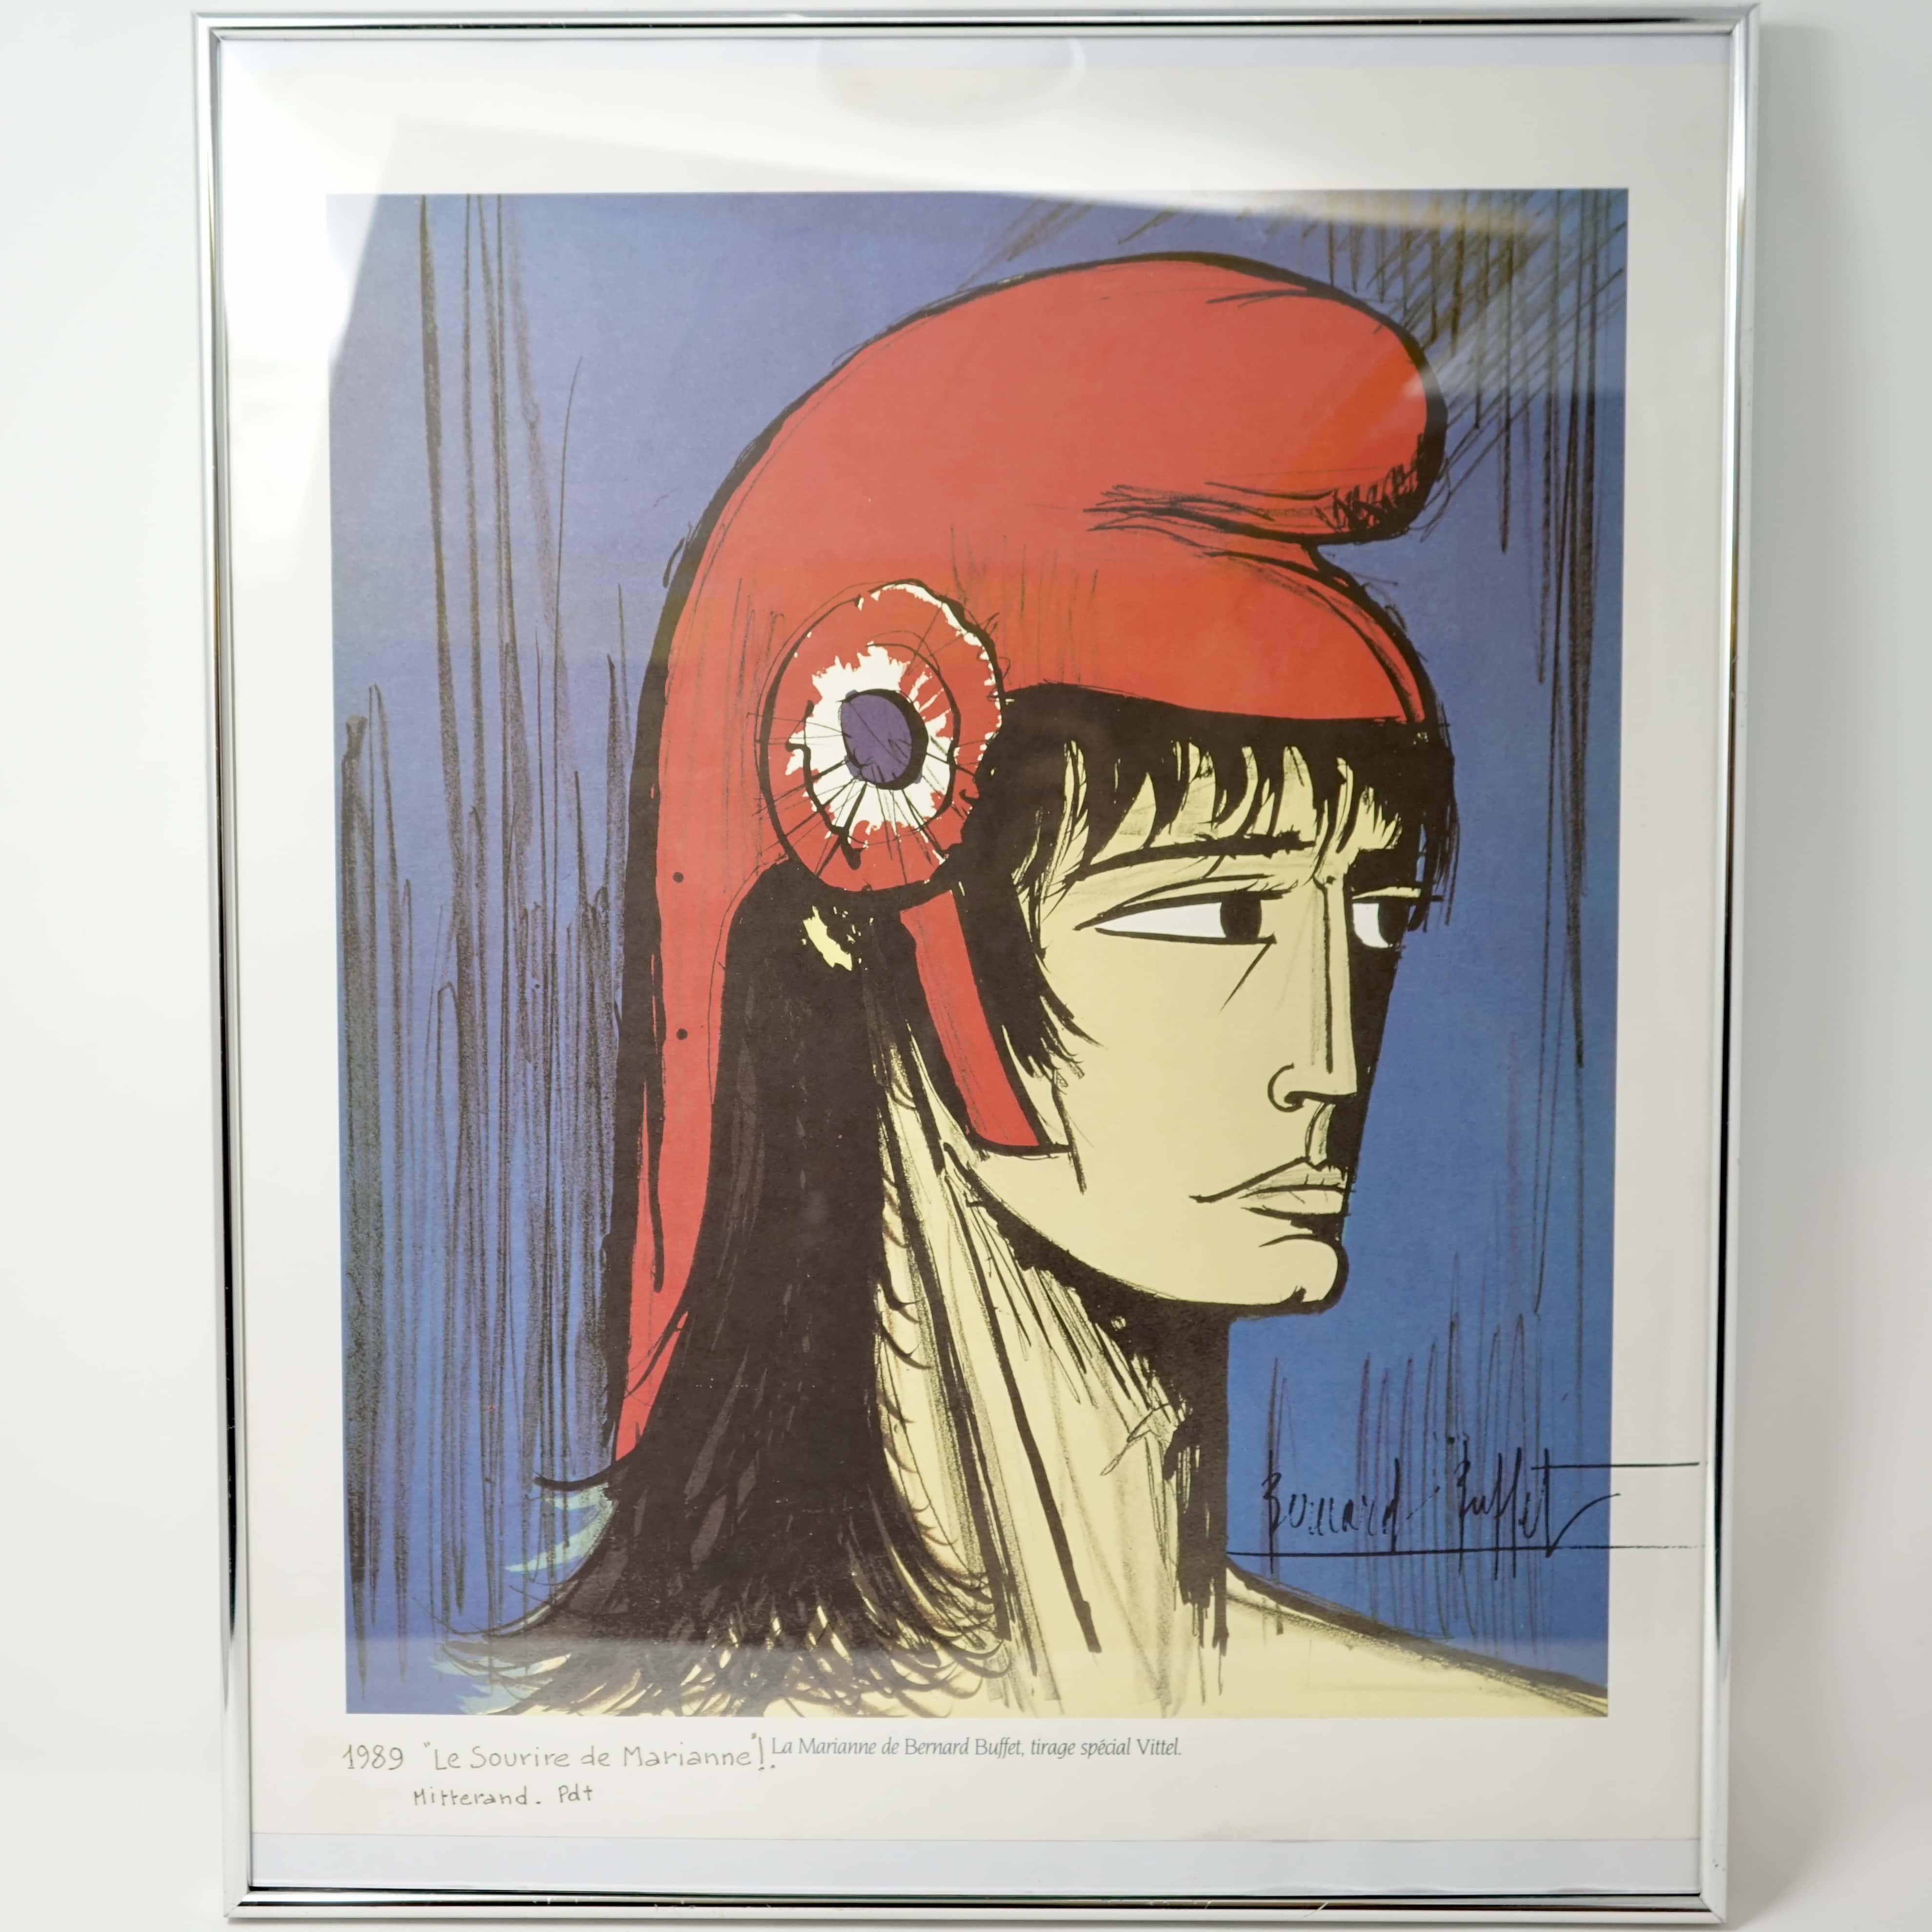 Affiche Bernard Buffet Le Sourire de Marianne 1989